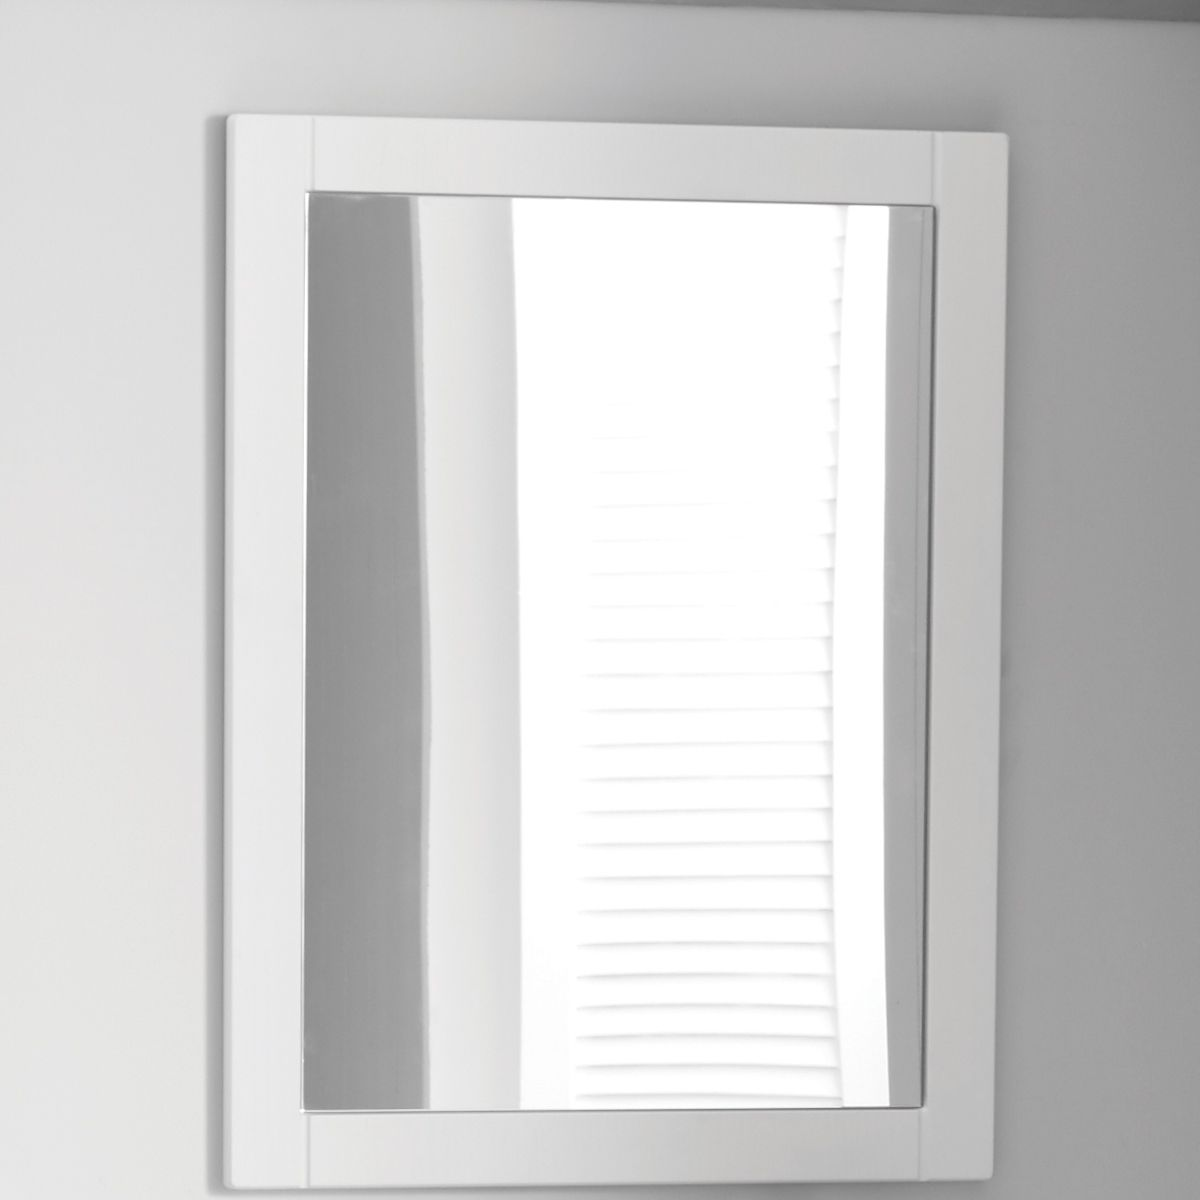 Elation Sendai White Wood Grain Framed Mirror 450mm